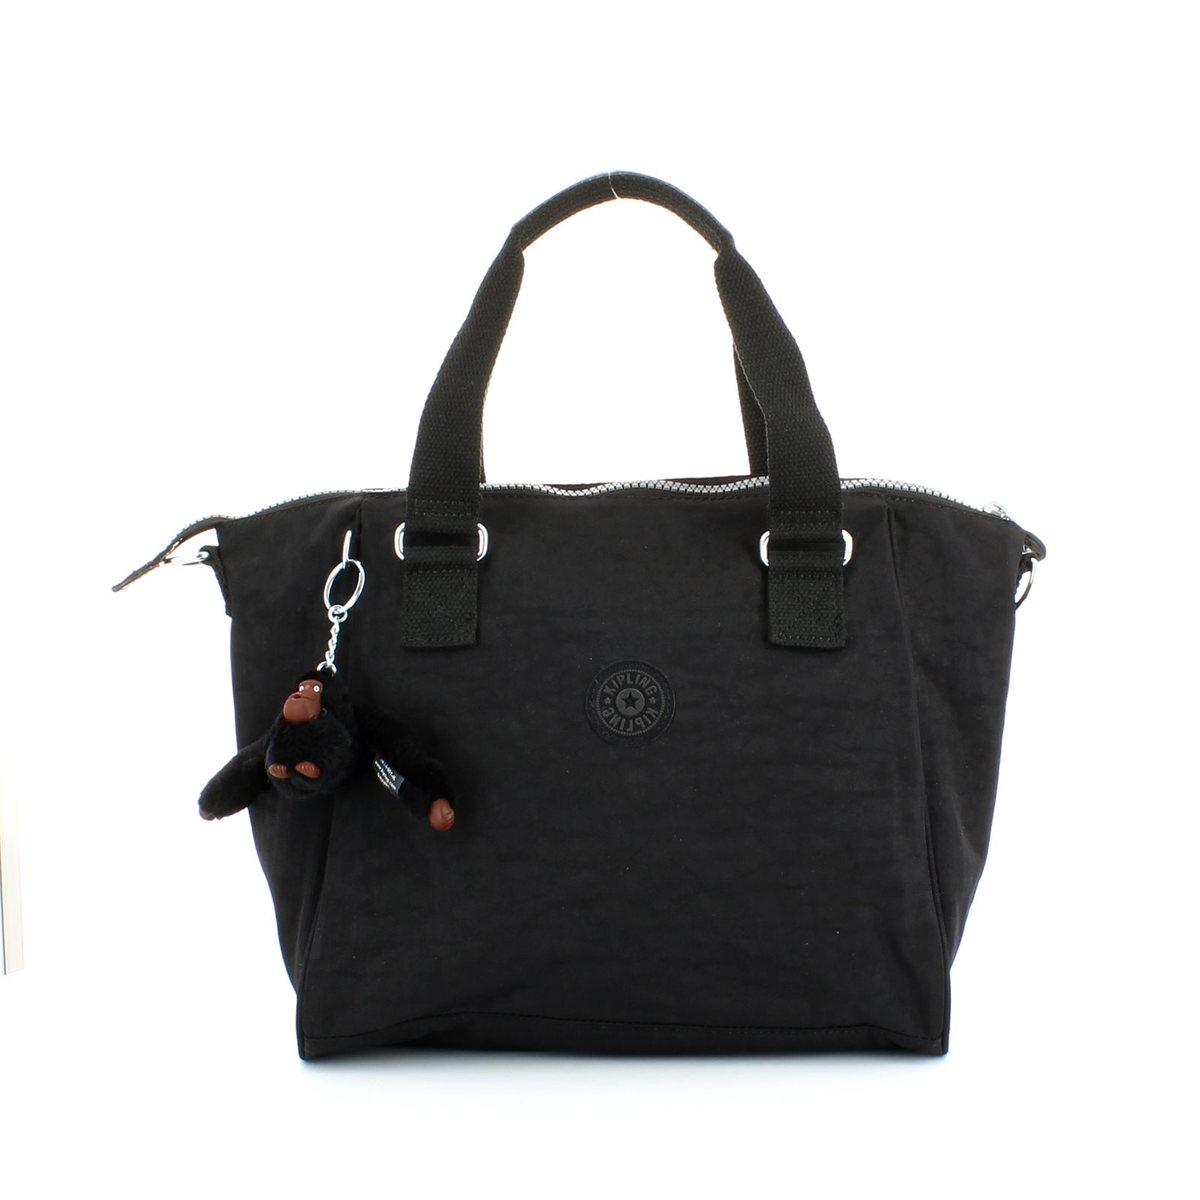 Kipling Bags AMIEL Black handbag